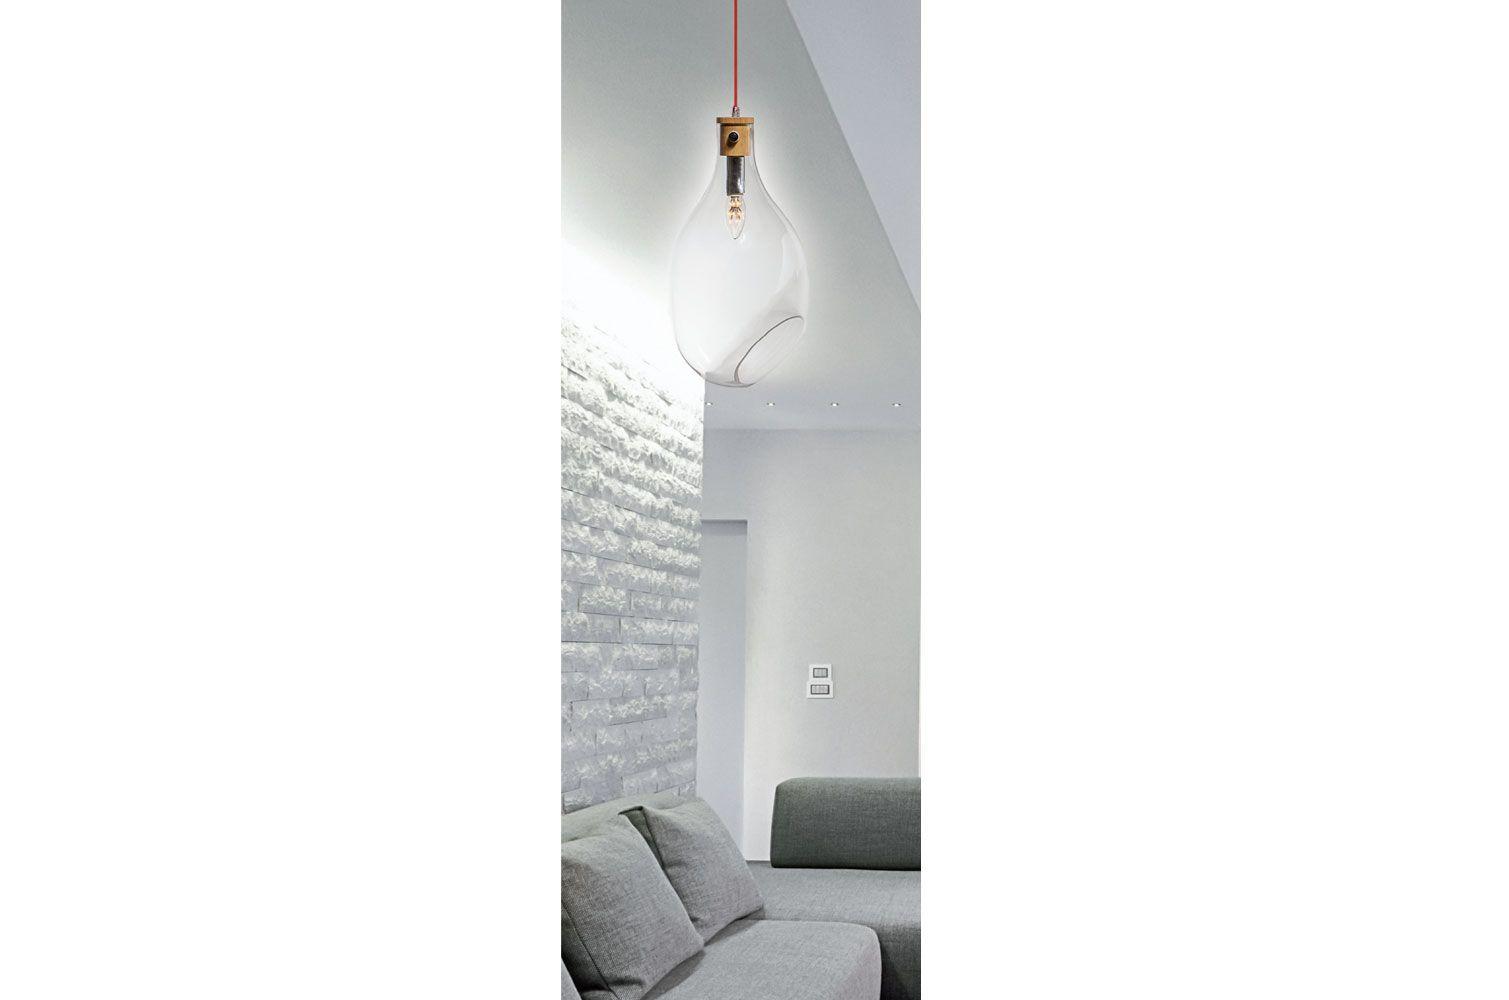 Concept Verre Luminaires Et Lampes Design Bacchus Lampe Design Luminaire Design